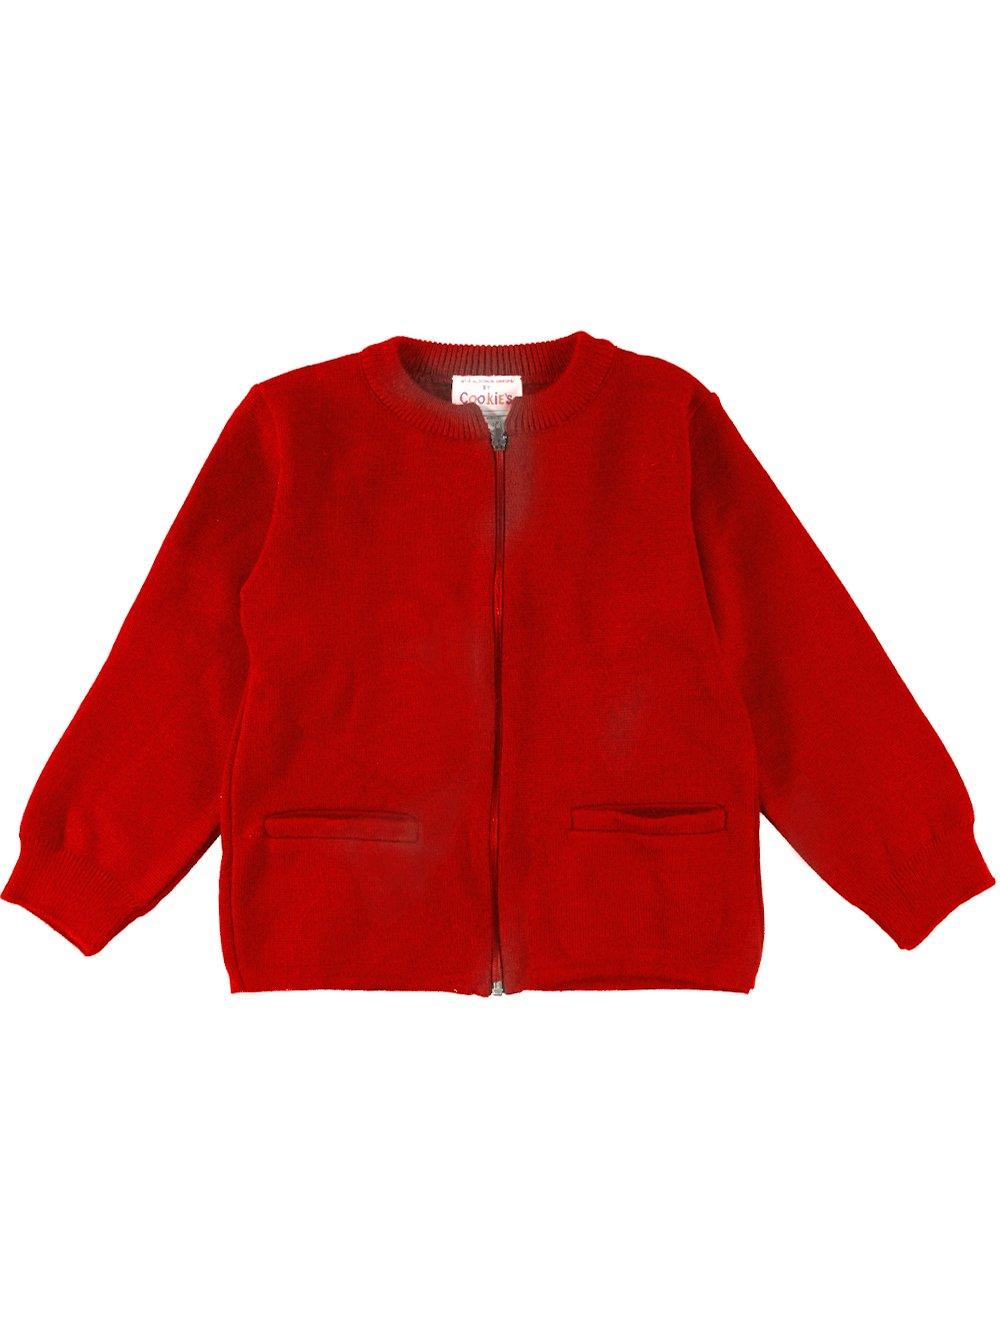 Cookie's Brand Little Girls' Zip-Up Cardigan - red, 6